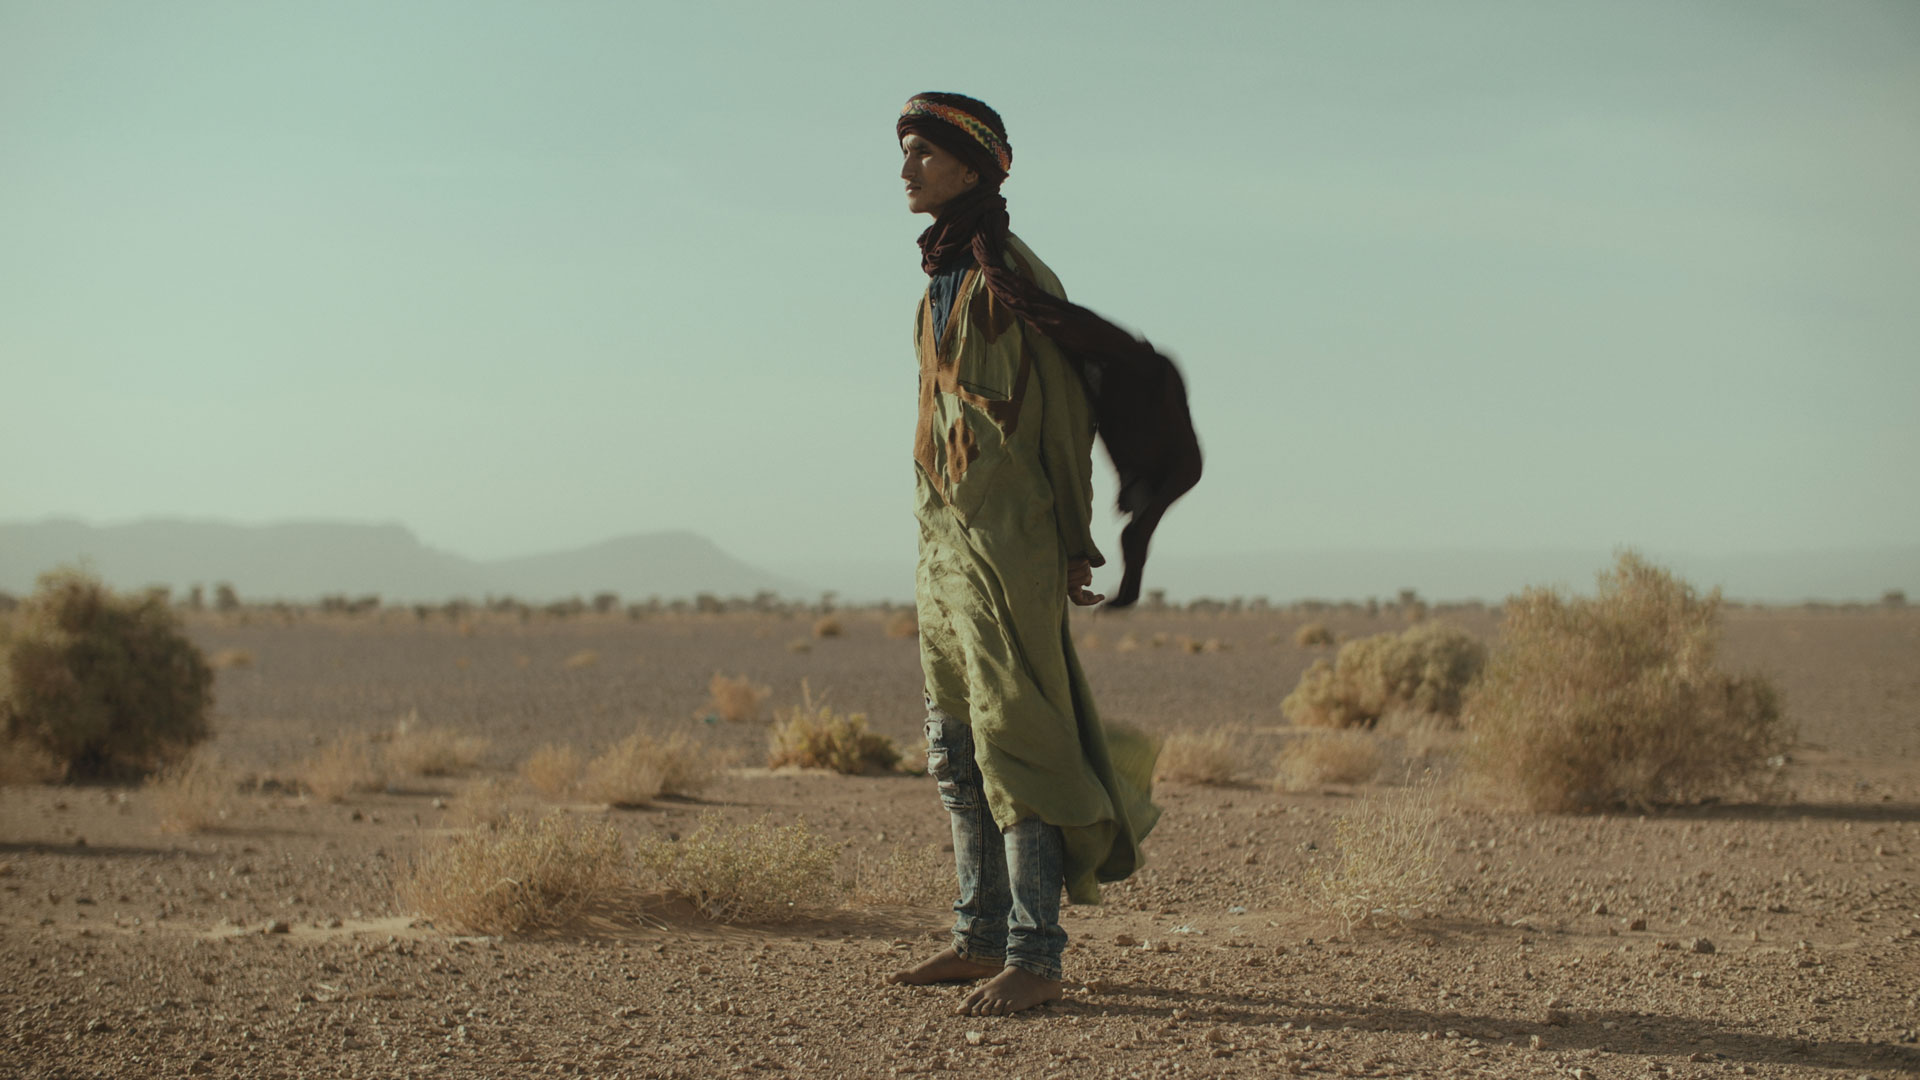 Timadrit in Sahara